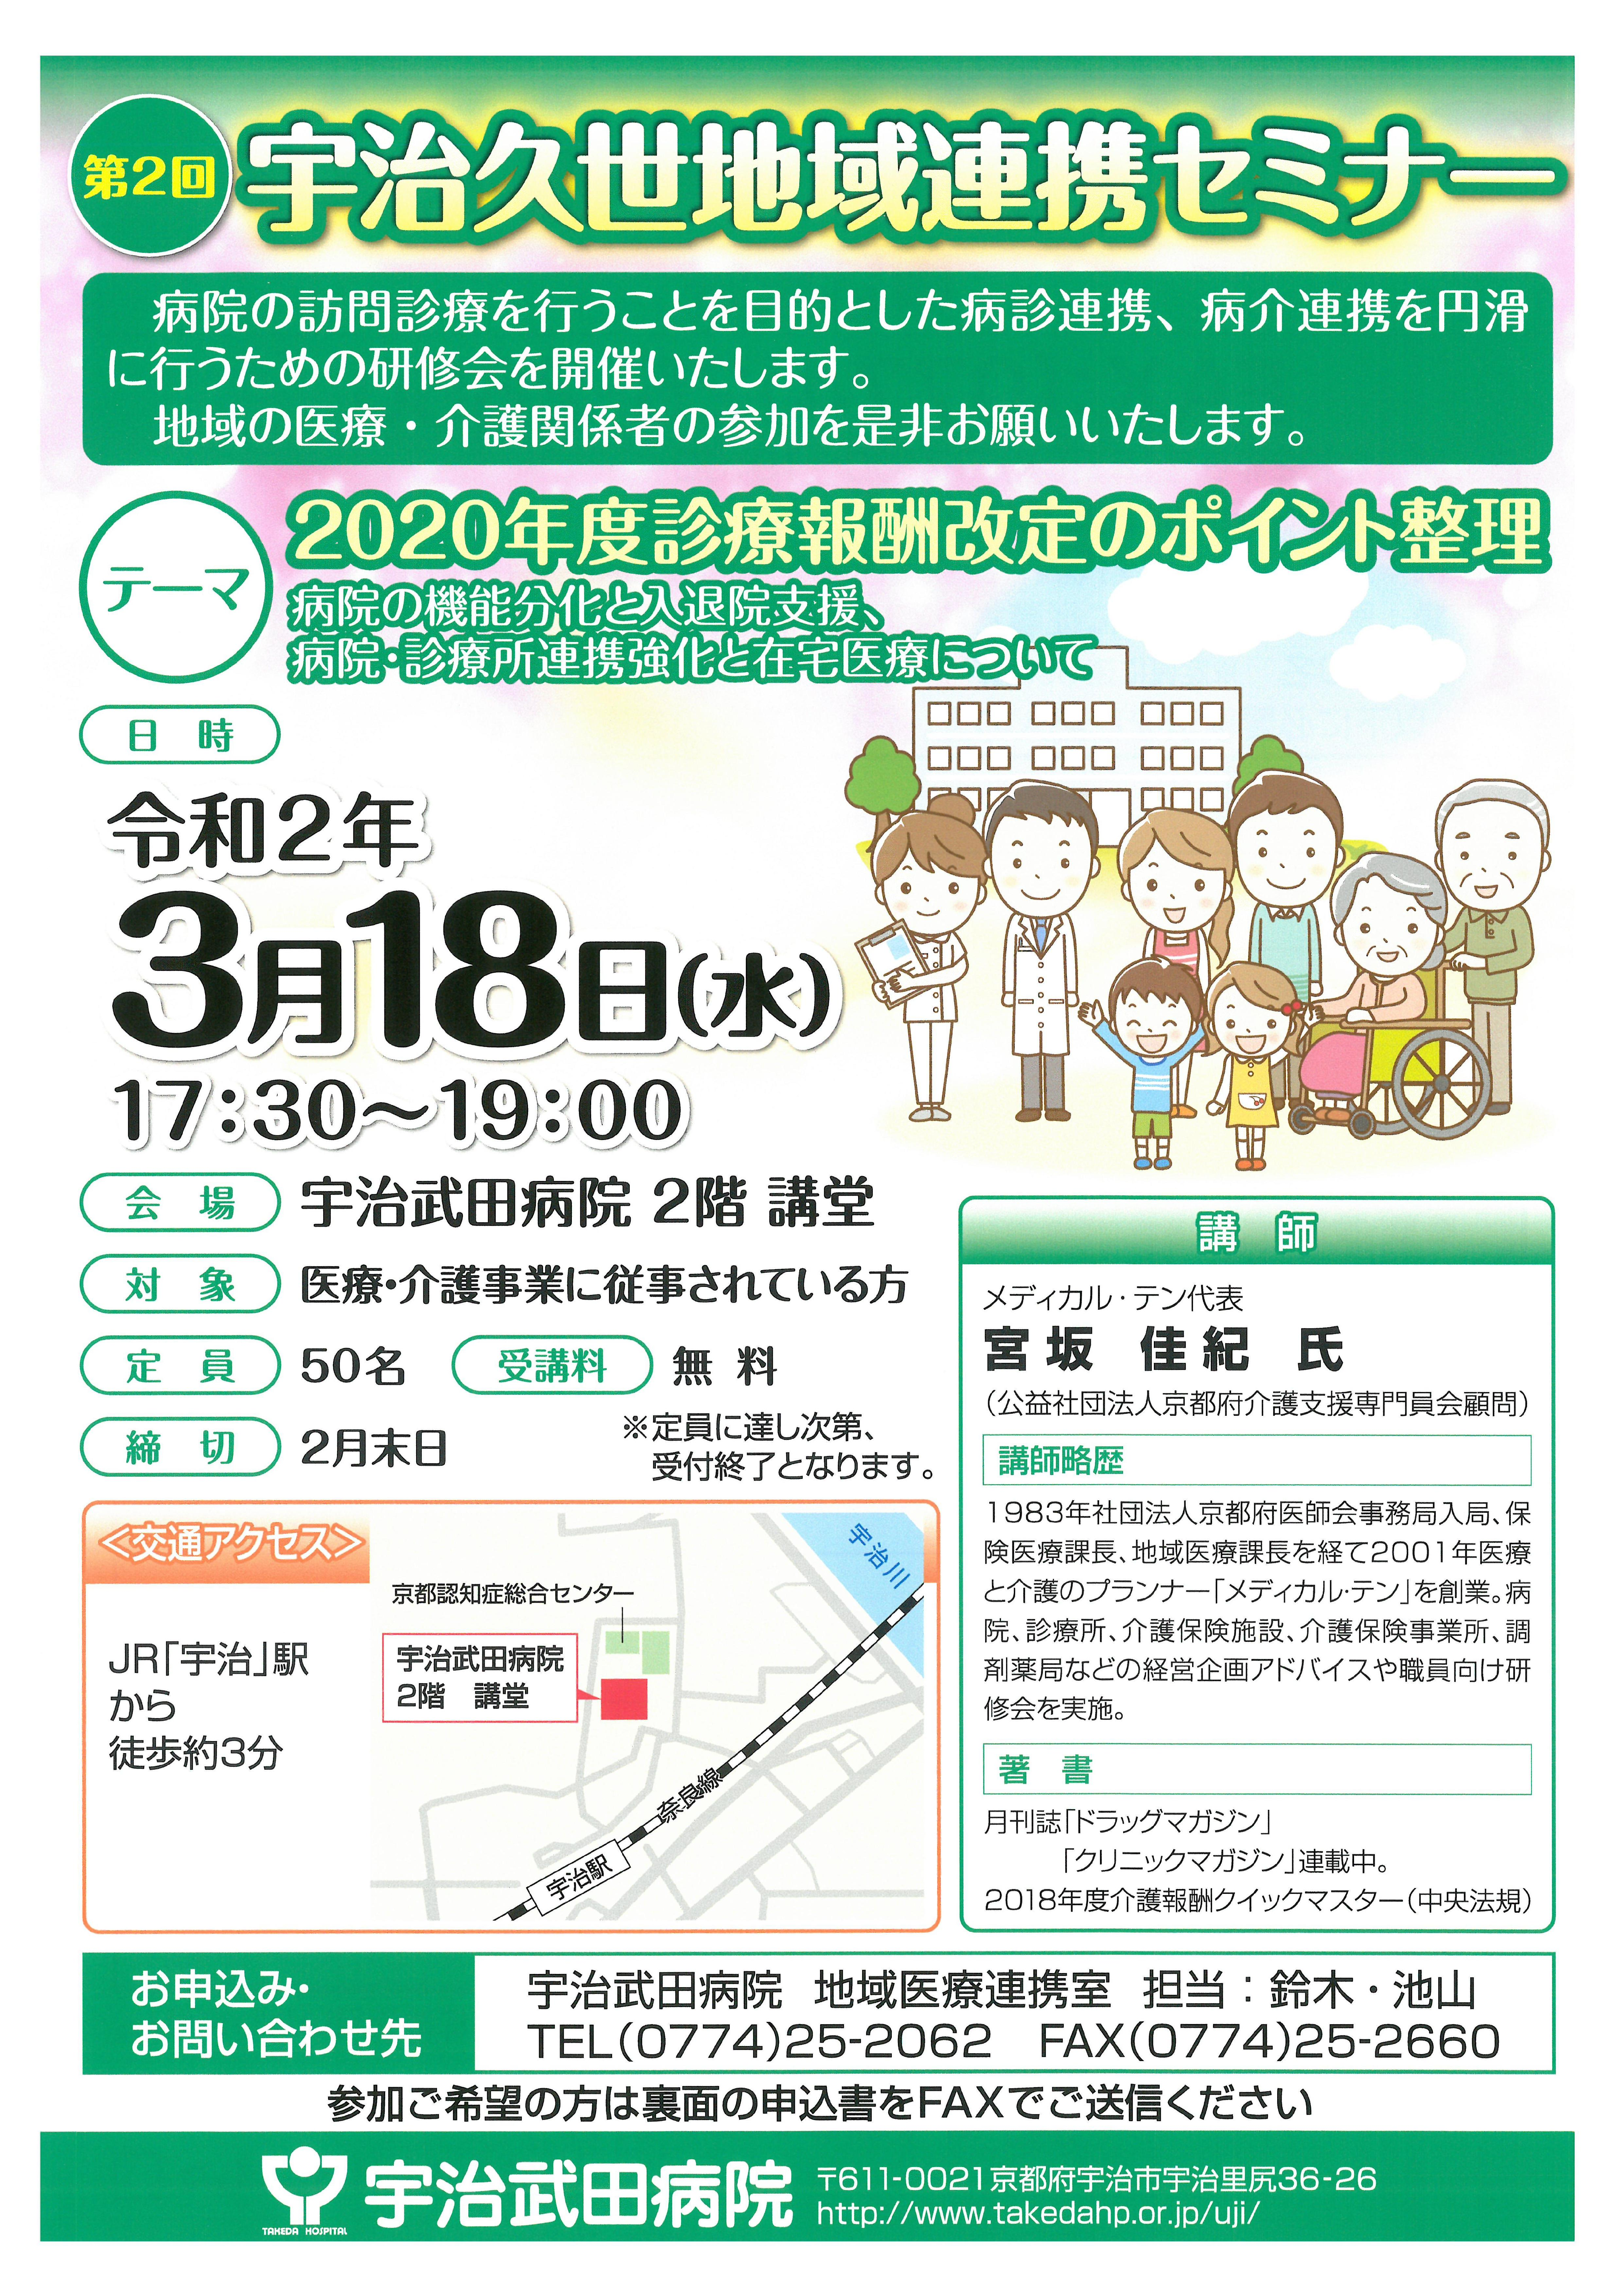 https://www.takedahp.or.jp/publicity/items/semina.jpg